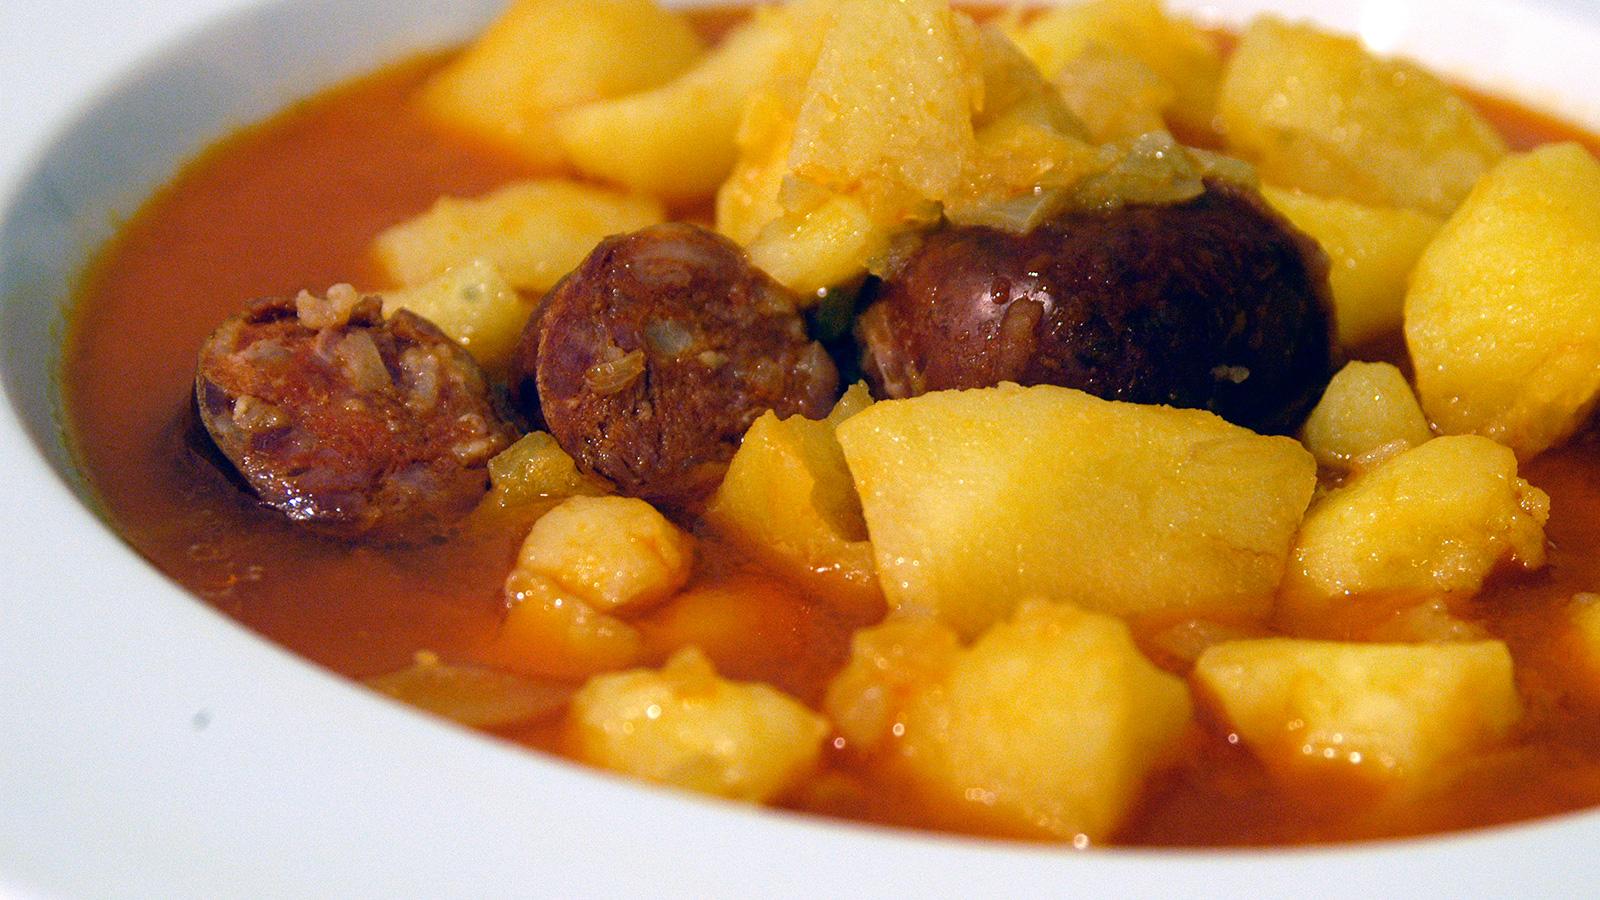 Patatas guisadas con chorizo i aki oyarbide video receta canal cocina - Judias con chorizo y patatas ...